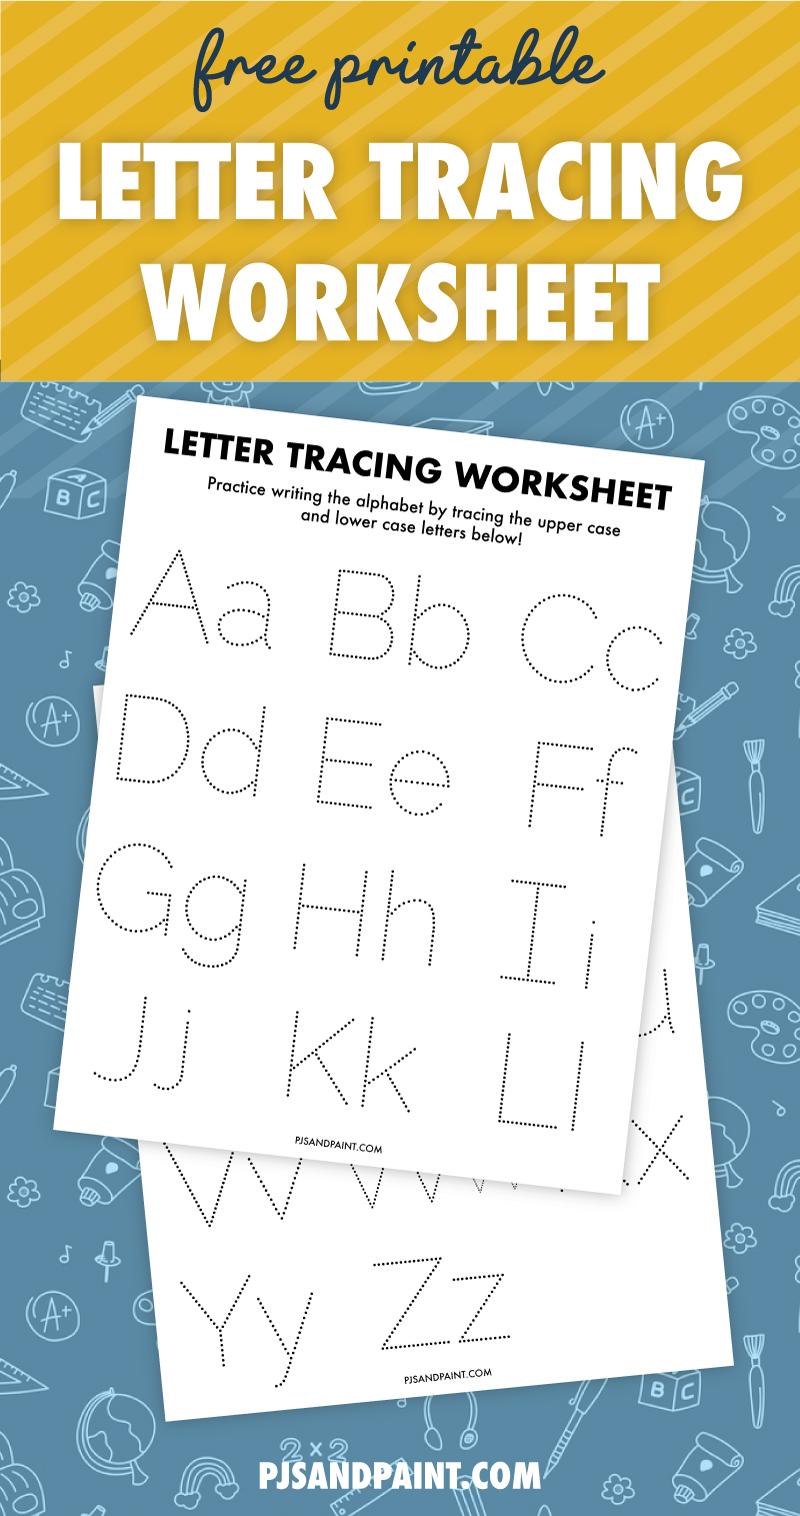 free printable letter tracing worksheet